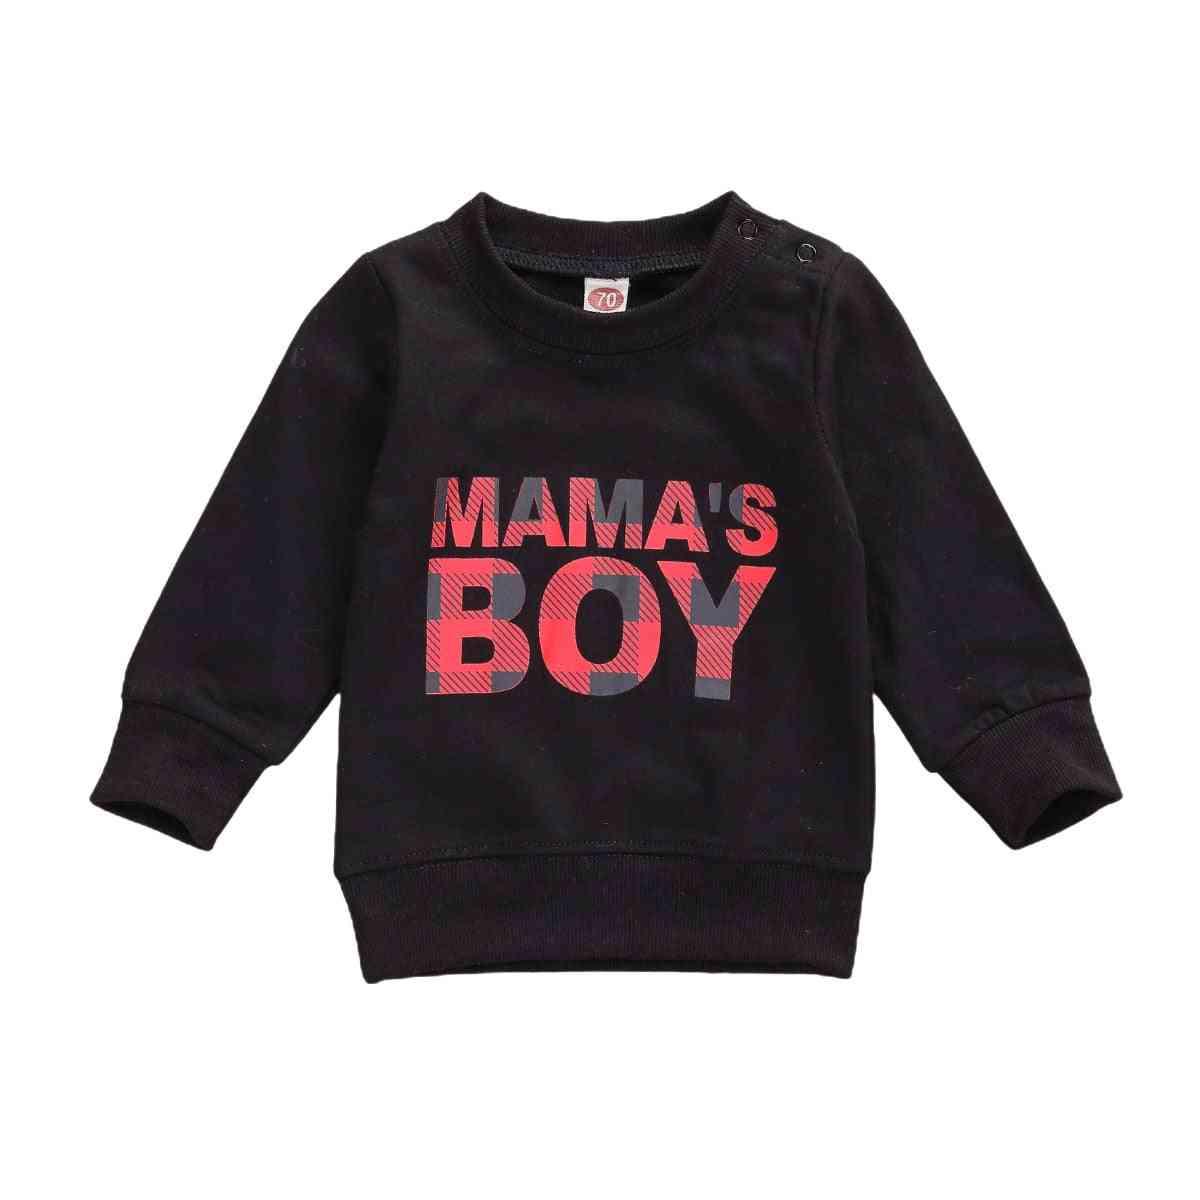 Newborn Baby Boy Girl Sweatshirt Autumn Spring Letter Print Long Sleeve Tops